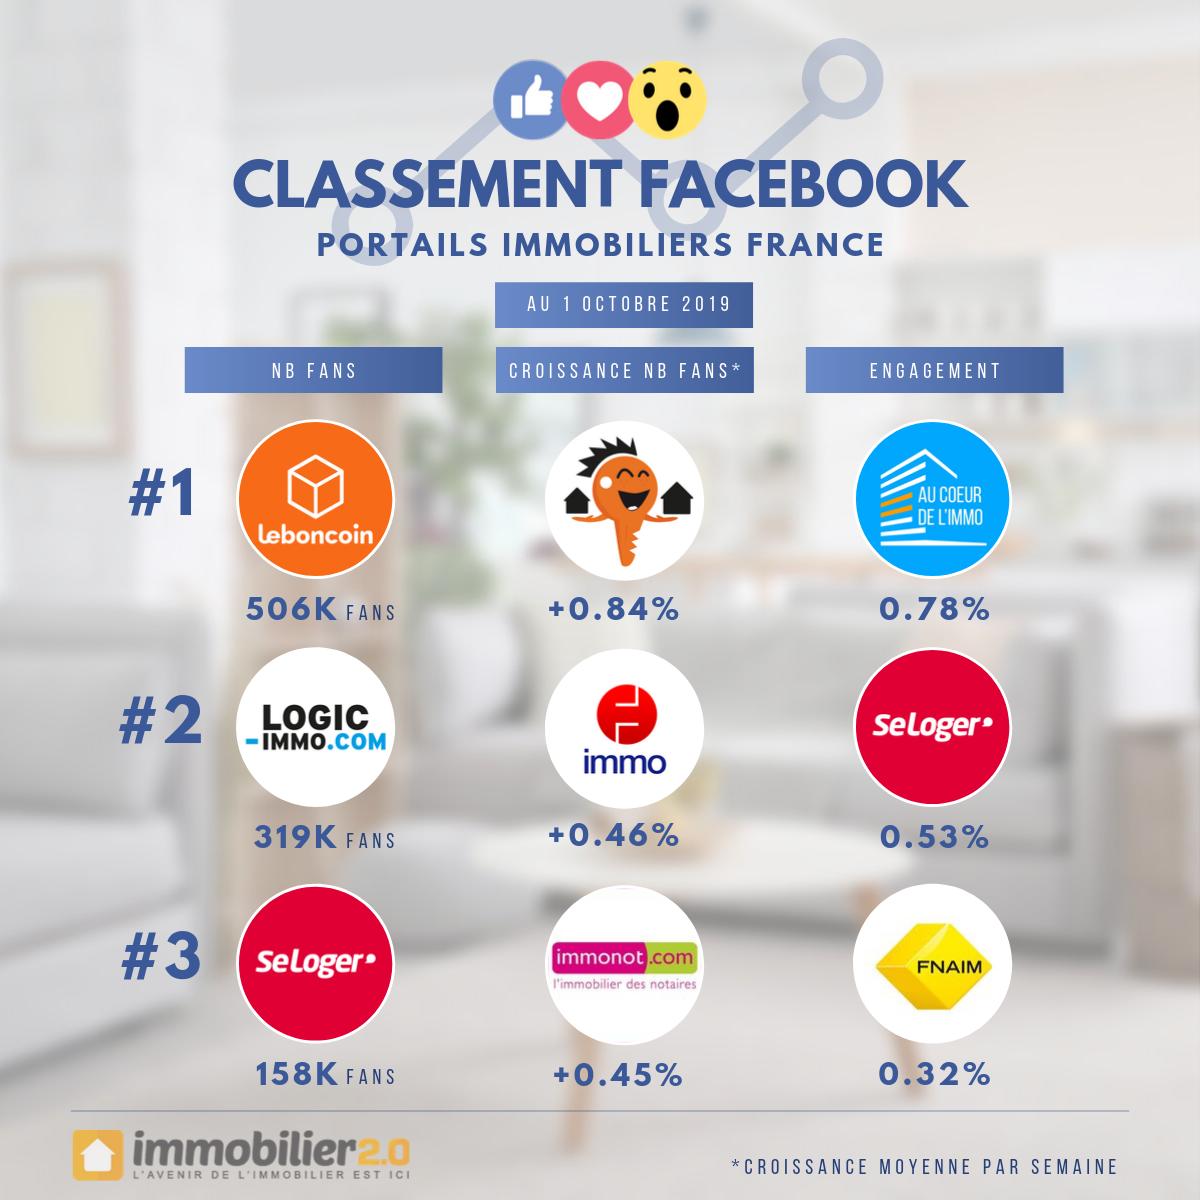 Classement Facebook Portails Immobiliers France Octobre 2019